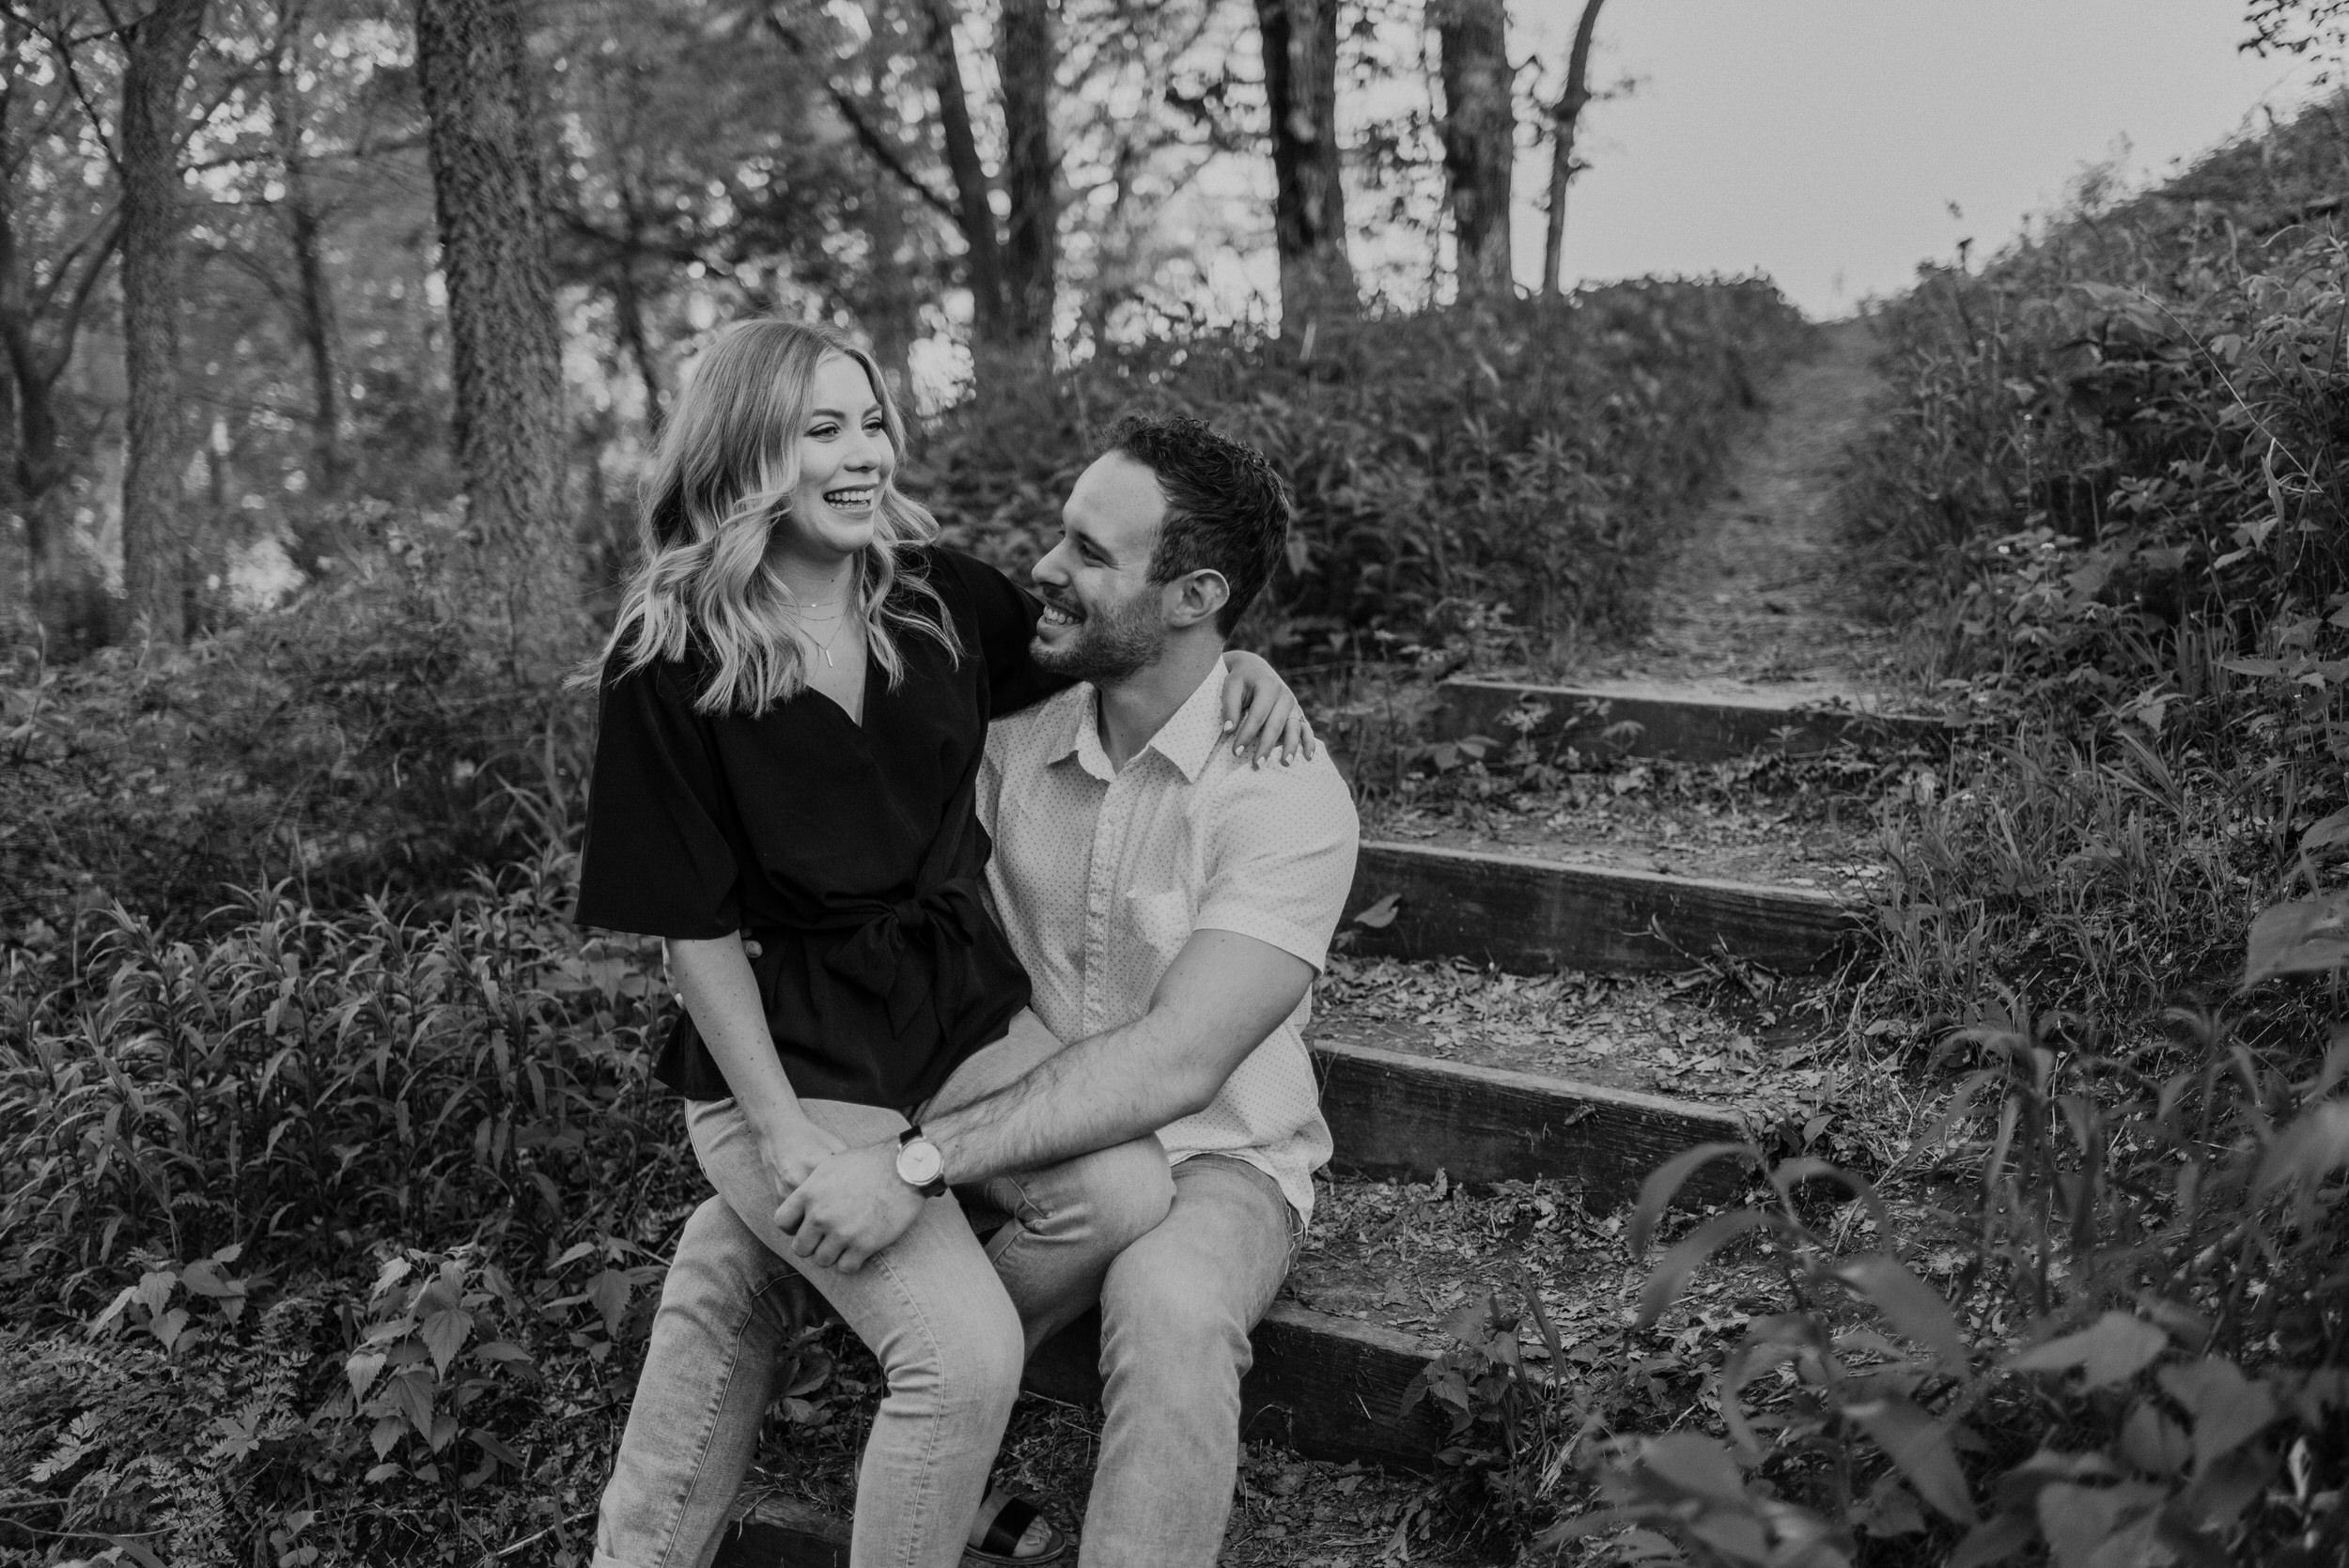 Omaha-Nebraska-Engagement-Session-Kaylie-Sirek-Photography-116.jpg